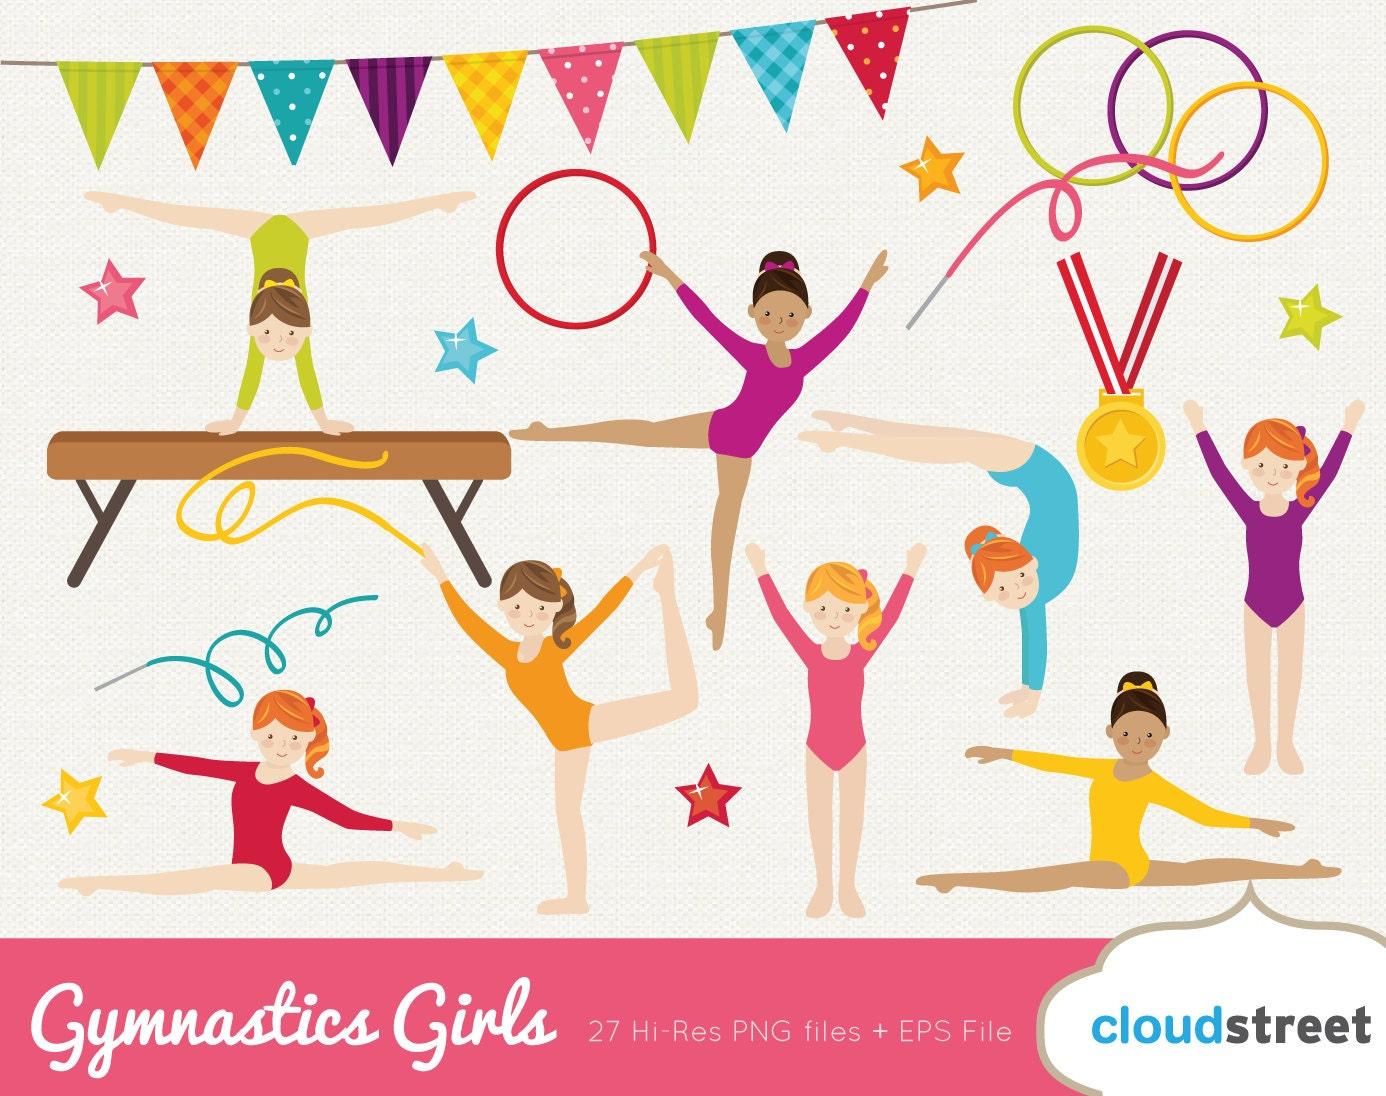 buy 2 get 1 free girl gymnastics clipart gymnastics clip art rh etsy com gymnastics clip art silhouette gymnastic clip art free